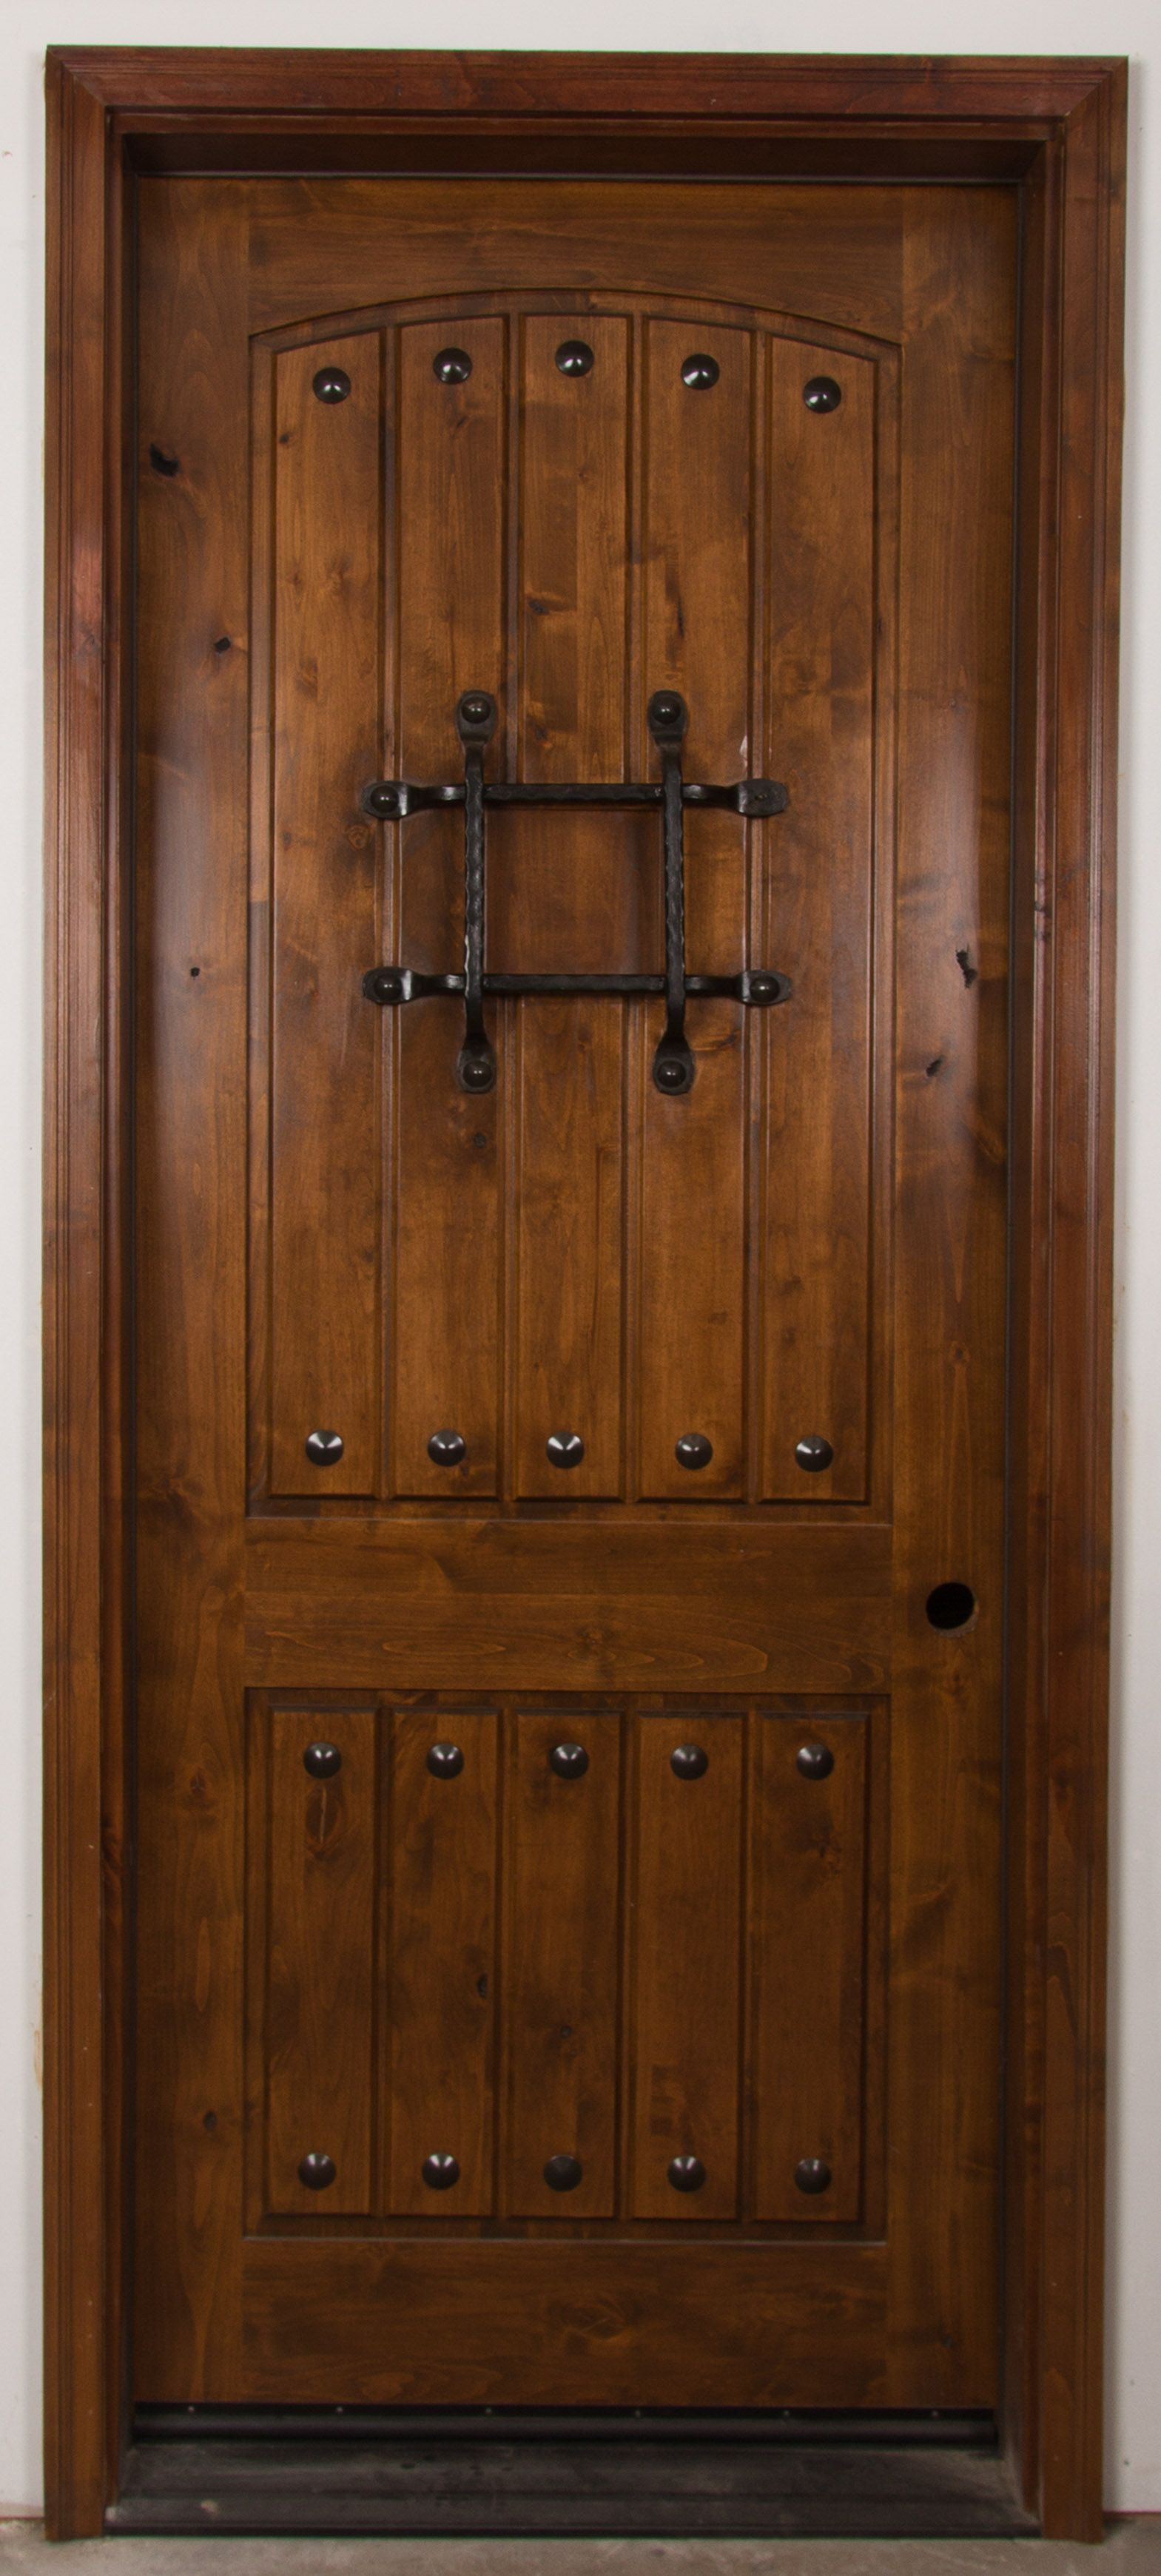 Exterior Front Door - Rustic Knotty Alder FSC® Certified- [RMKA] RMKA | & Exterior Front Door - Rustic Knotty Alder FSC® Certified- [RMKA ... pezcame.com